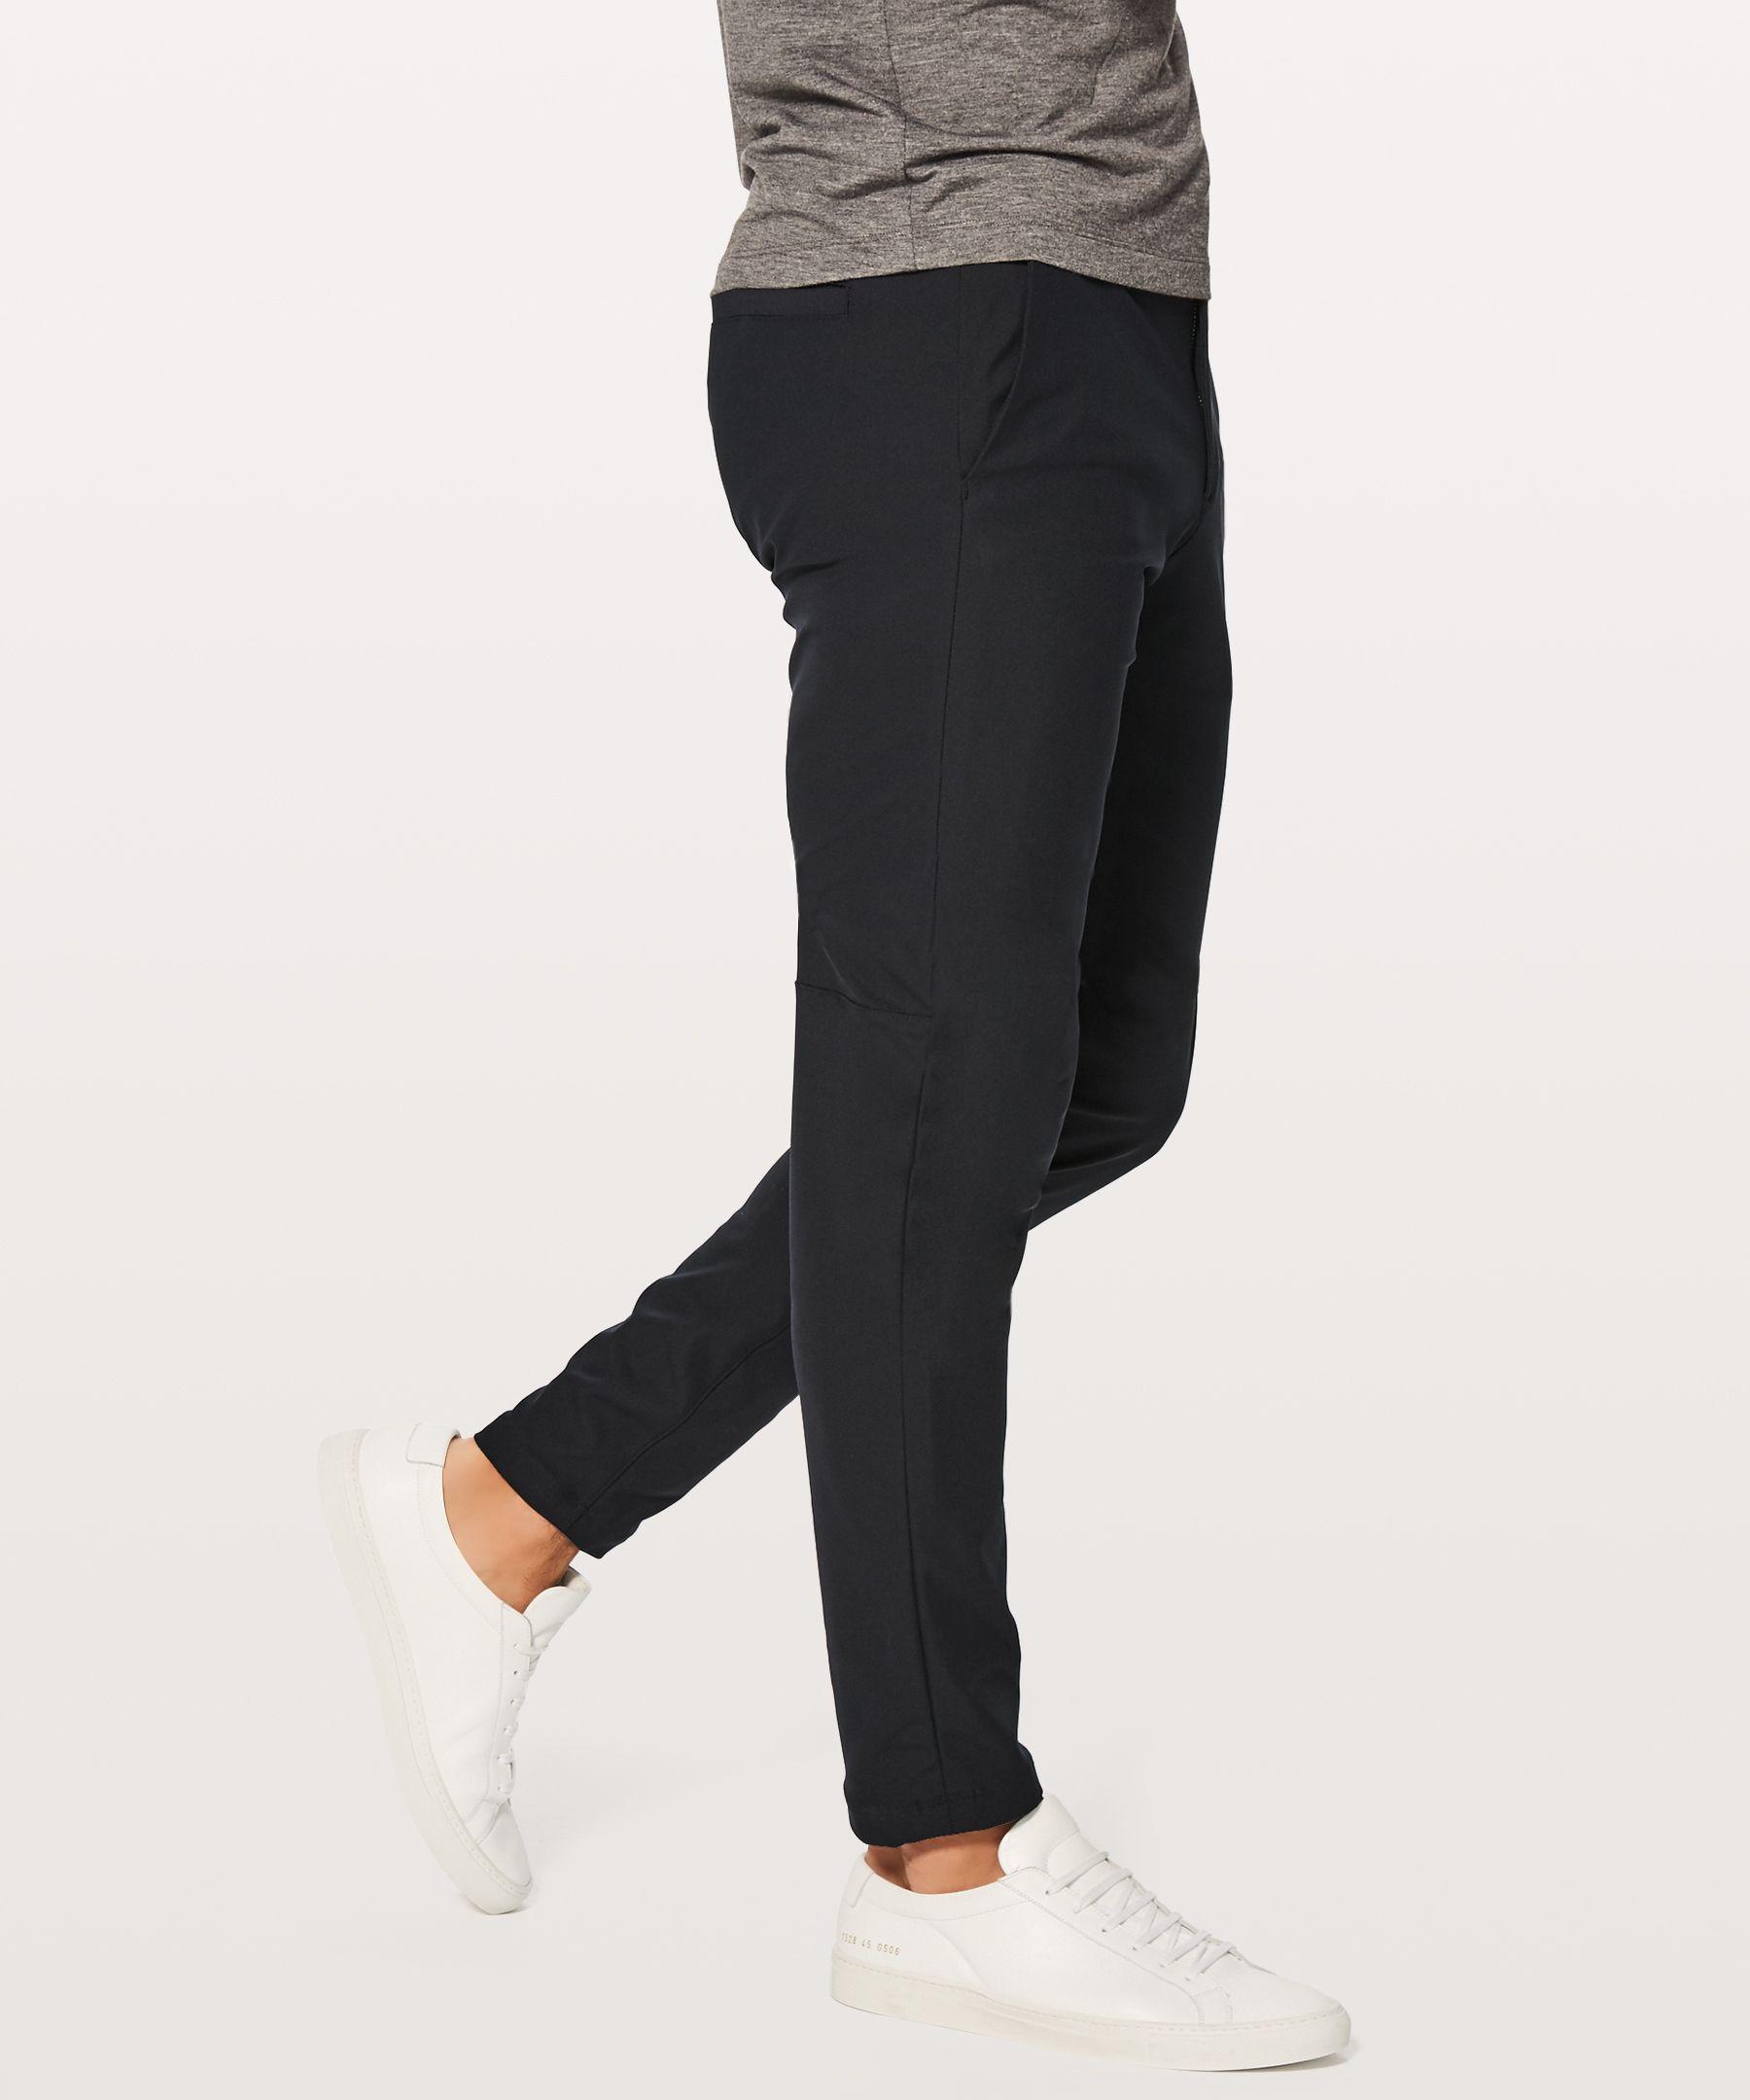 men u0027s yoga running pants workout pants lululemon athletica u0027